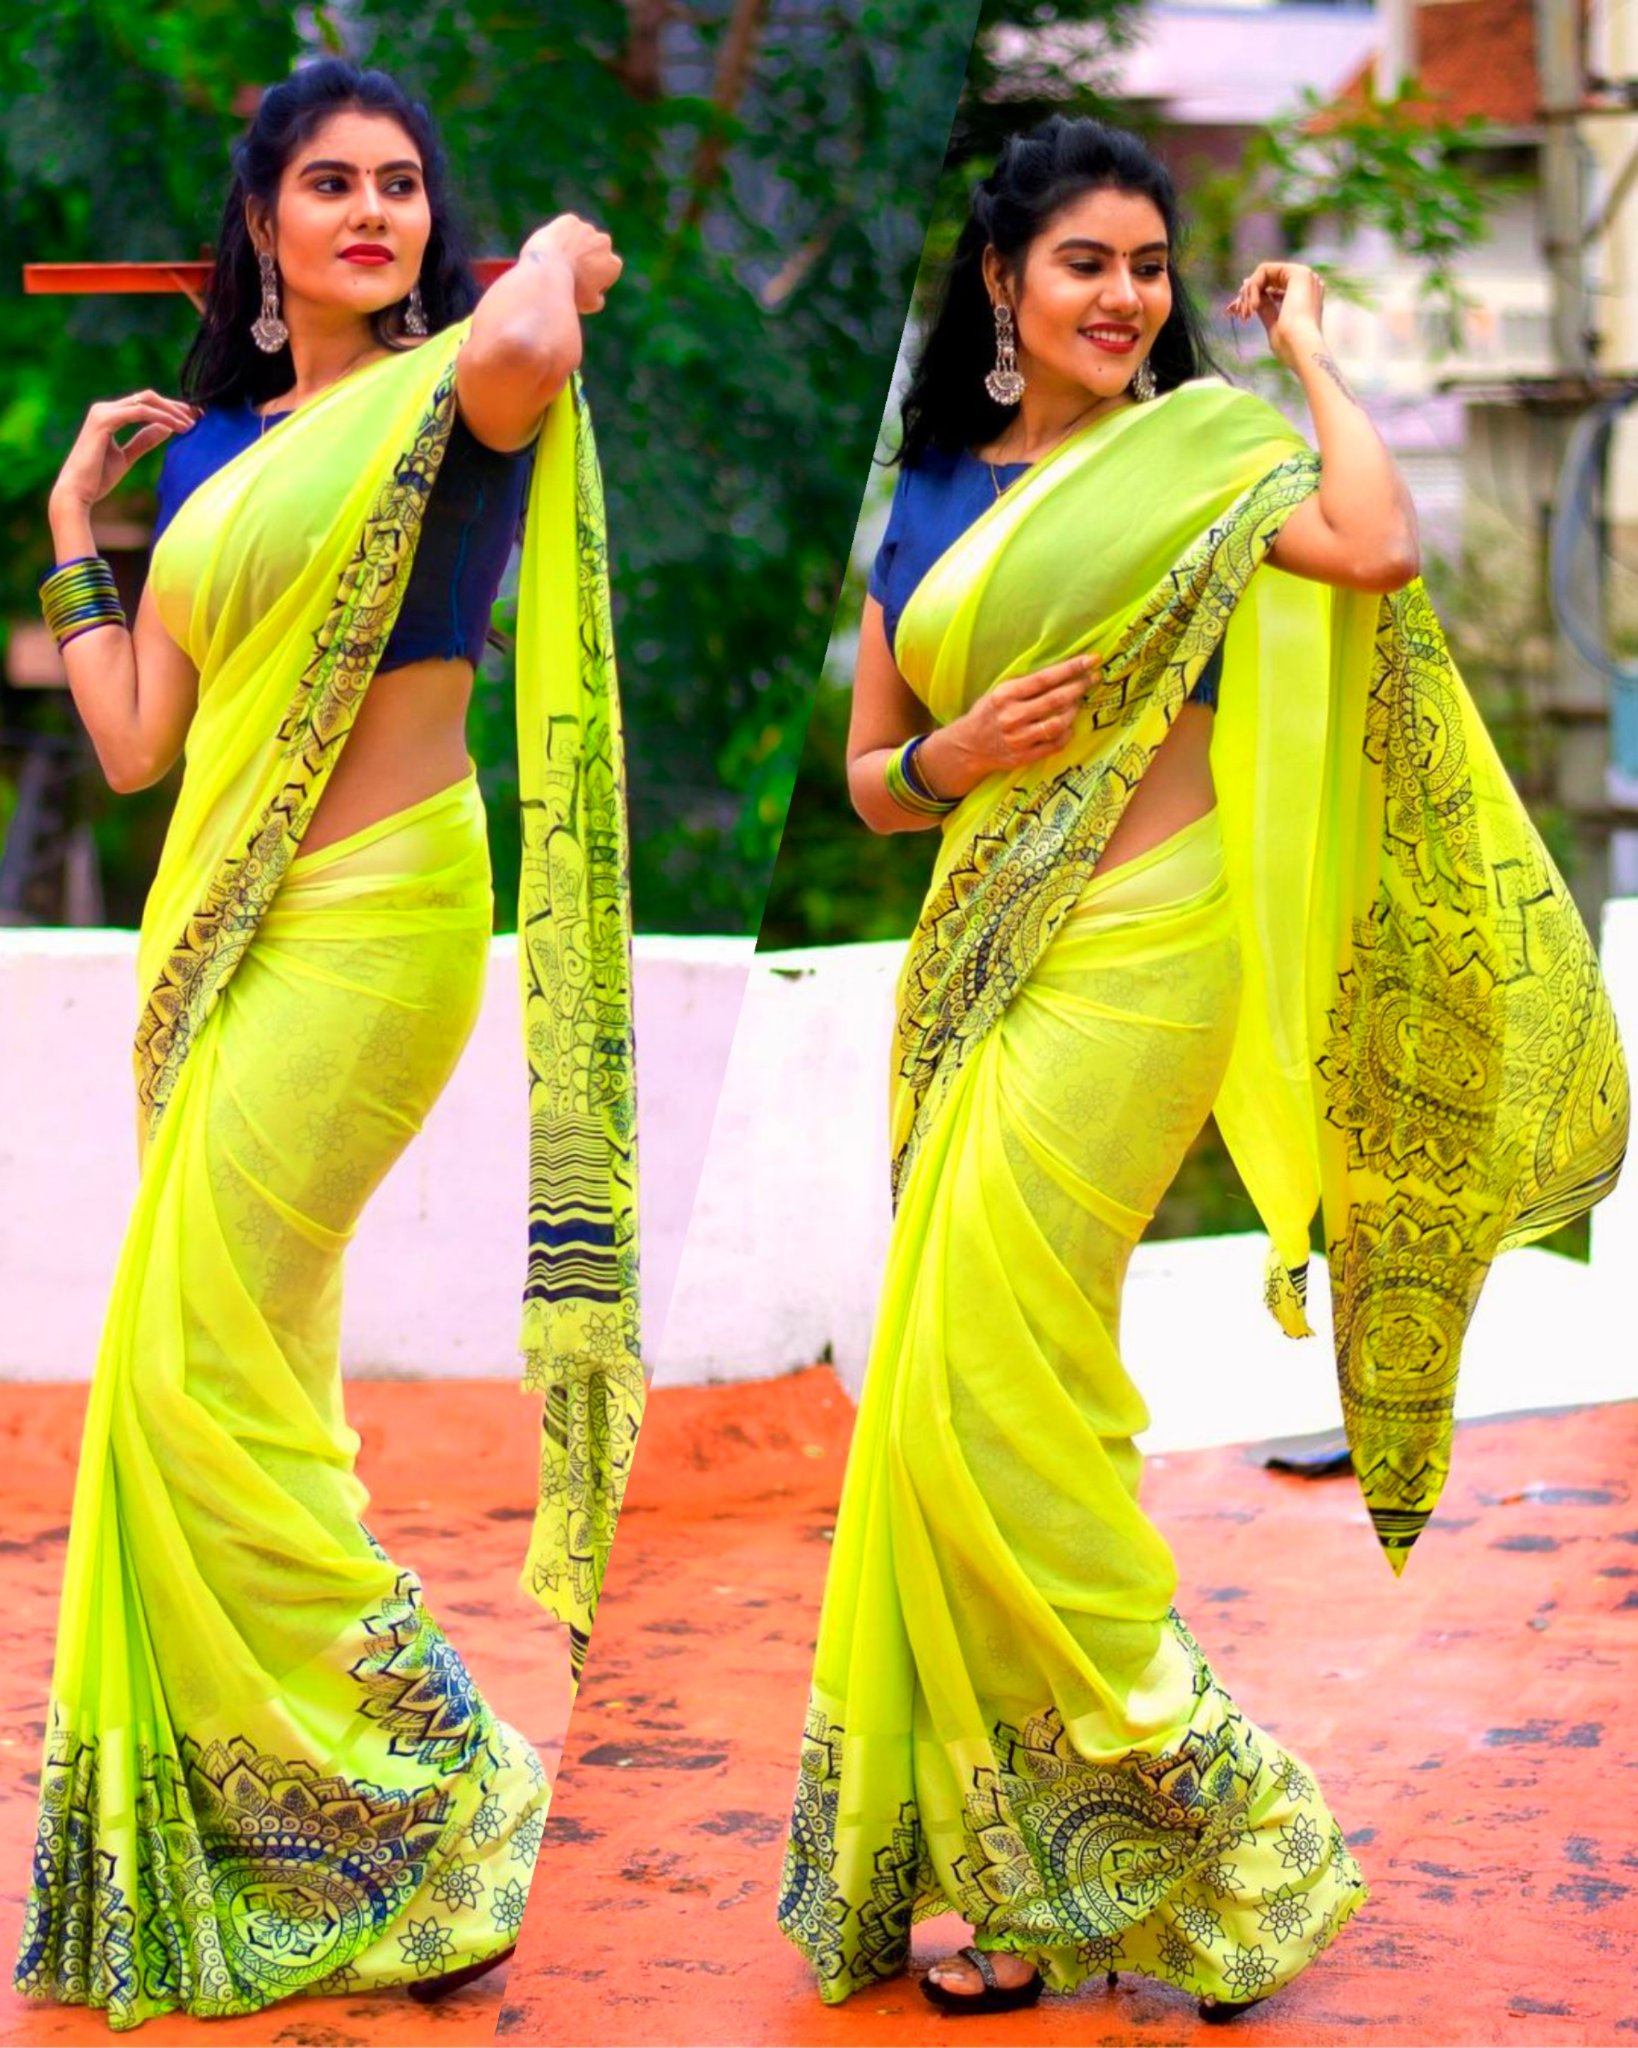 Tamil Serial Actor #Nivisha 💙💚 #Pics #TVSerial #TamilActress #Photoshoot #SelfieMoonji